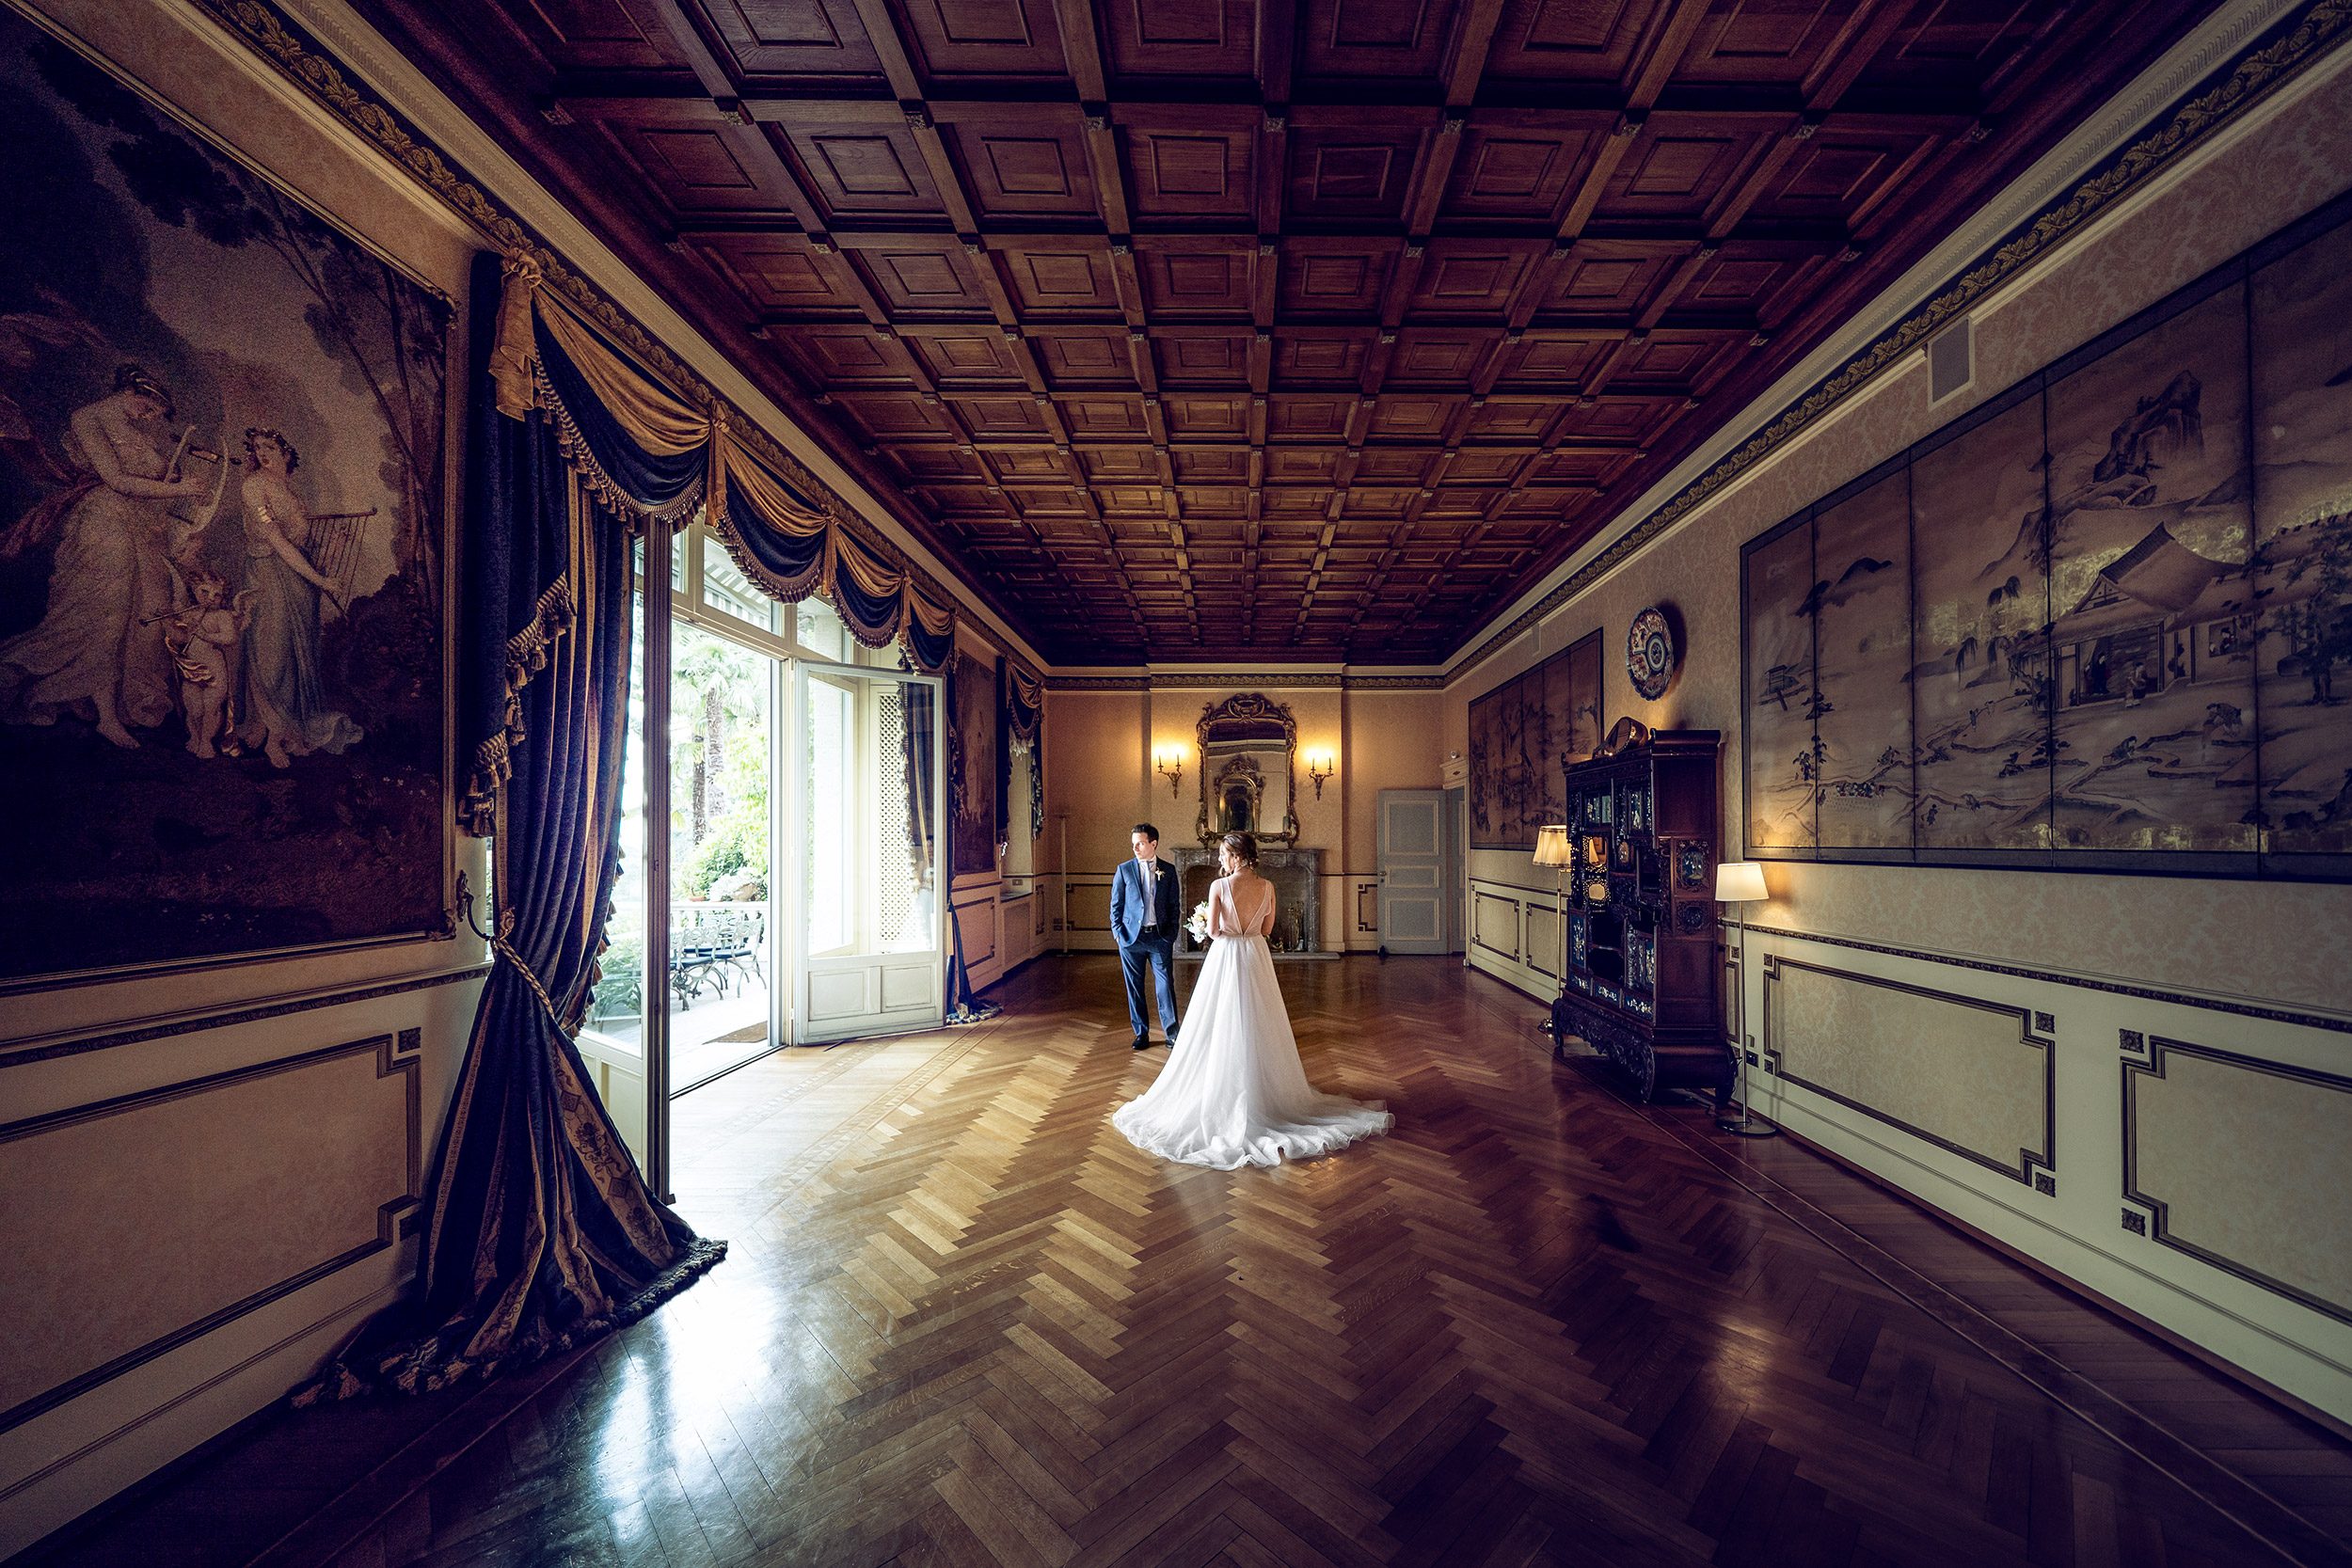 000 reportage wedding sposi foto matrimonio villa paradeisos varese 1